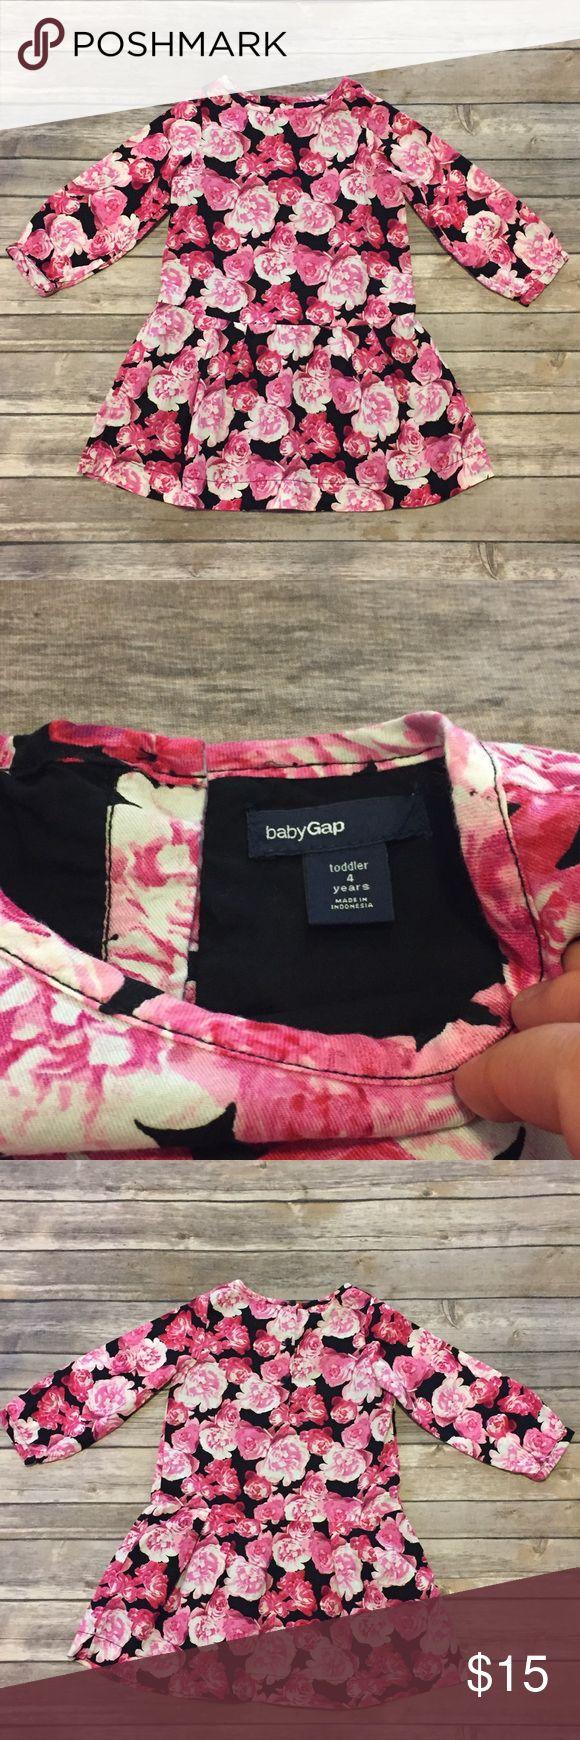 Baby Gap Dress, 4T Baby Gap Dress, 4T, lined rose dress 3/4 sleeves, slight drop waist. Buttons at back, EUC GAP Dresses